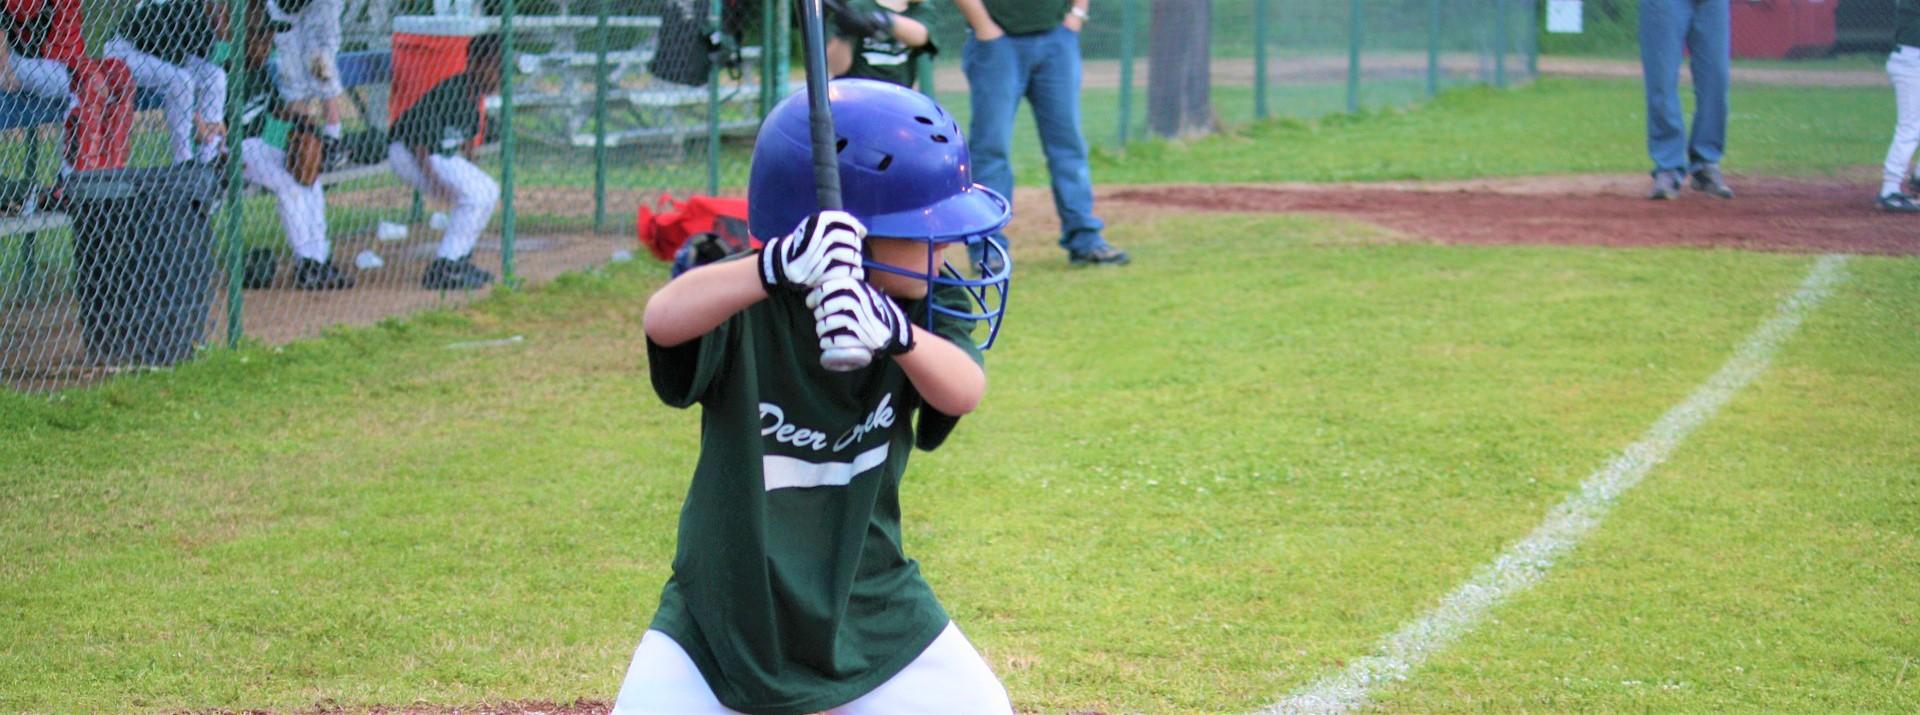 Little Boy Playing Baseball in Wisconsin | Kids Car Donations